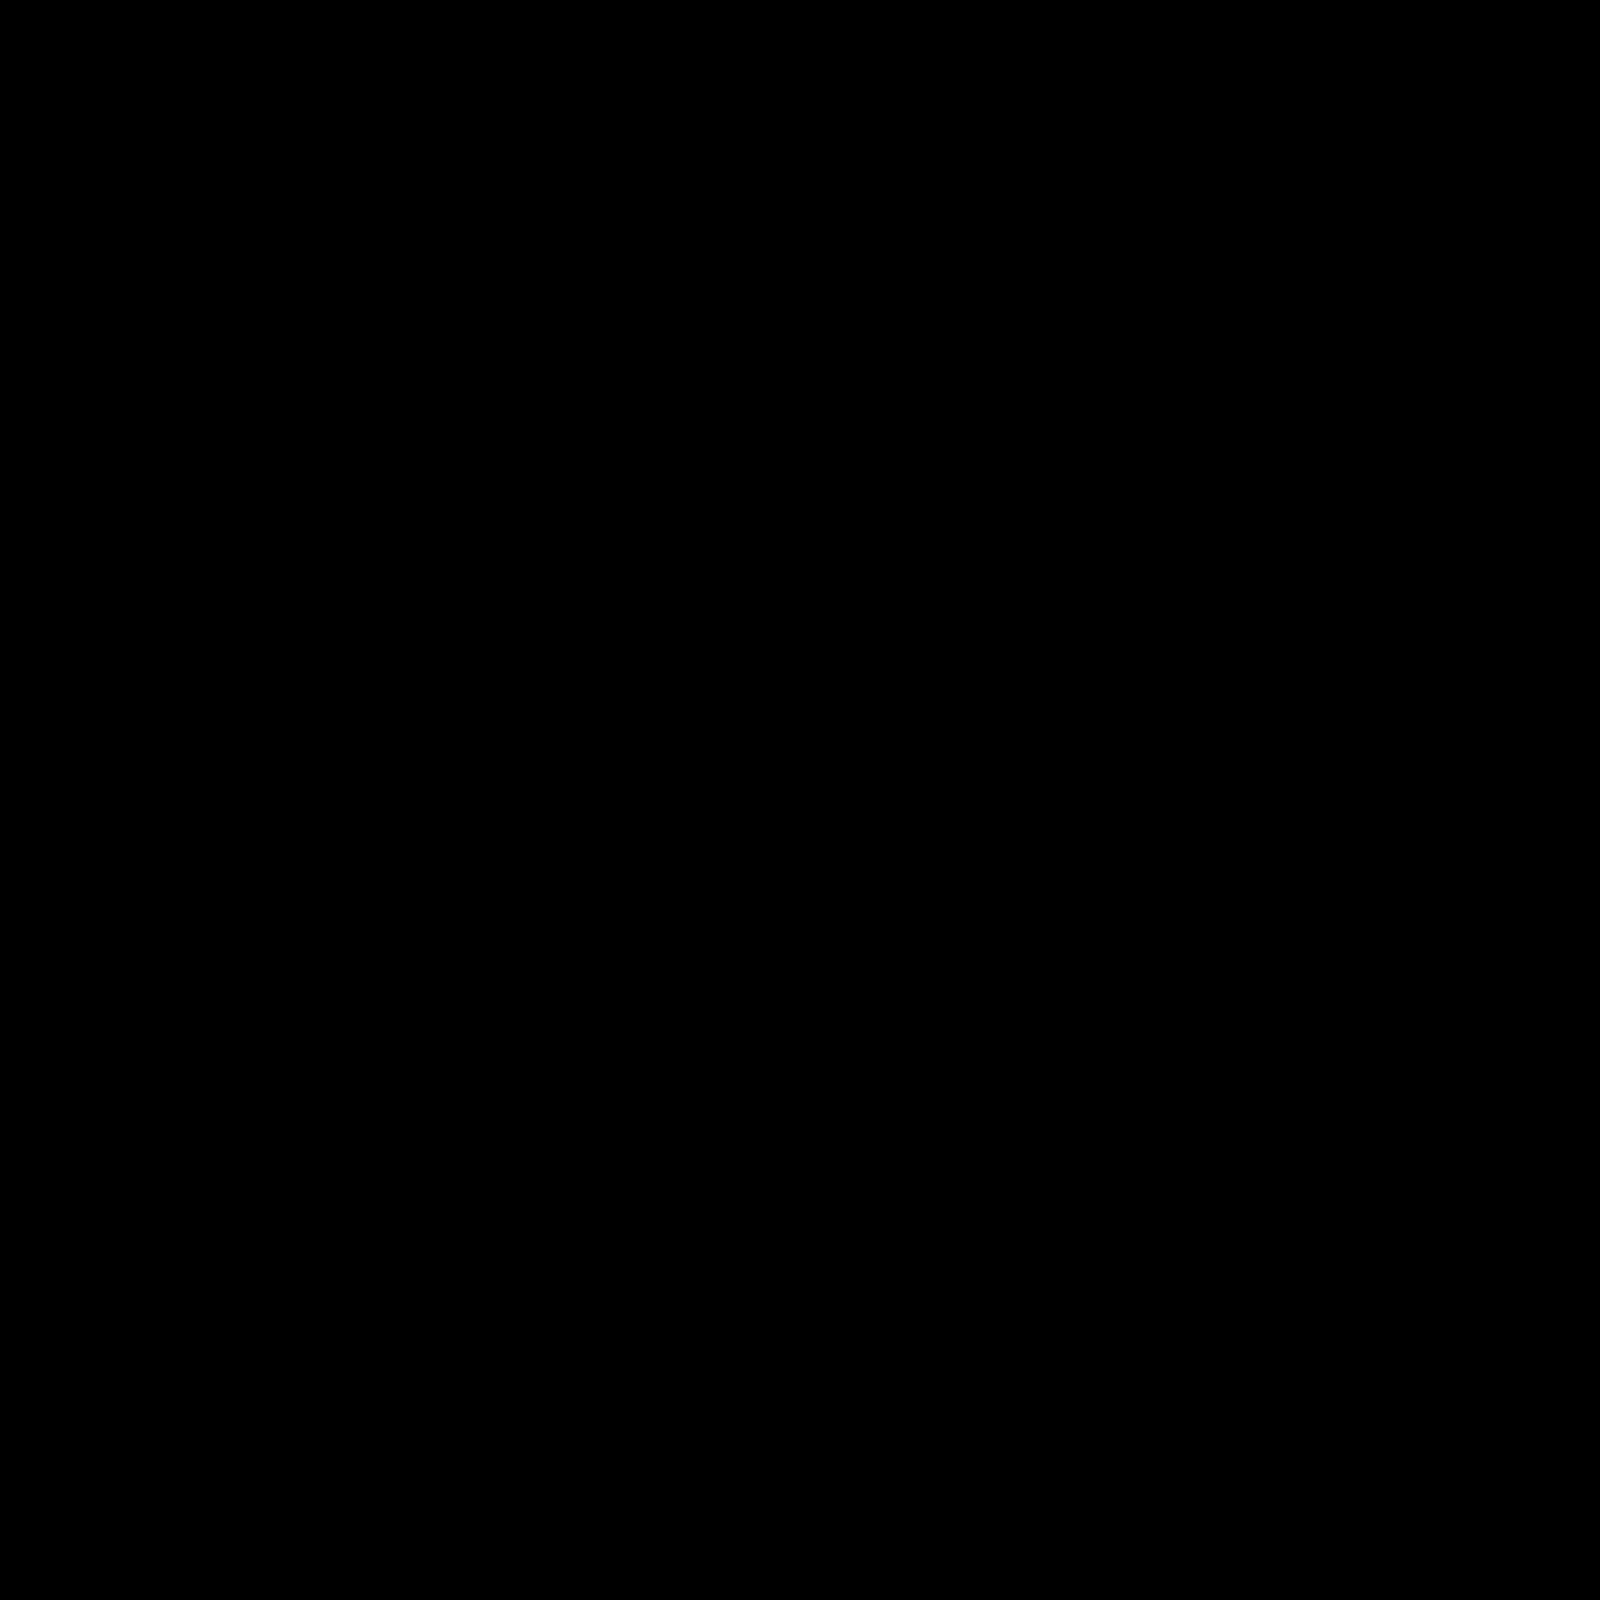 Okulary 3D icon